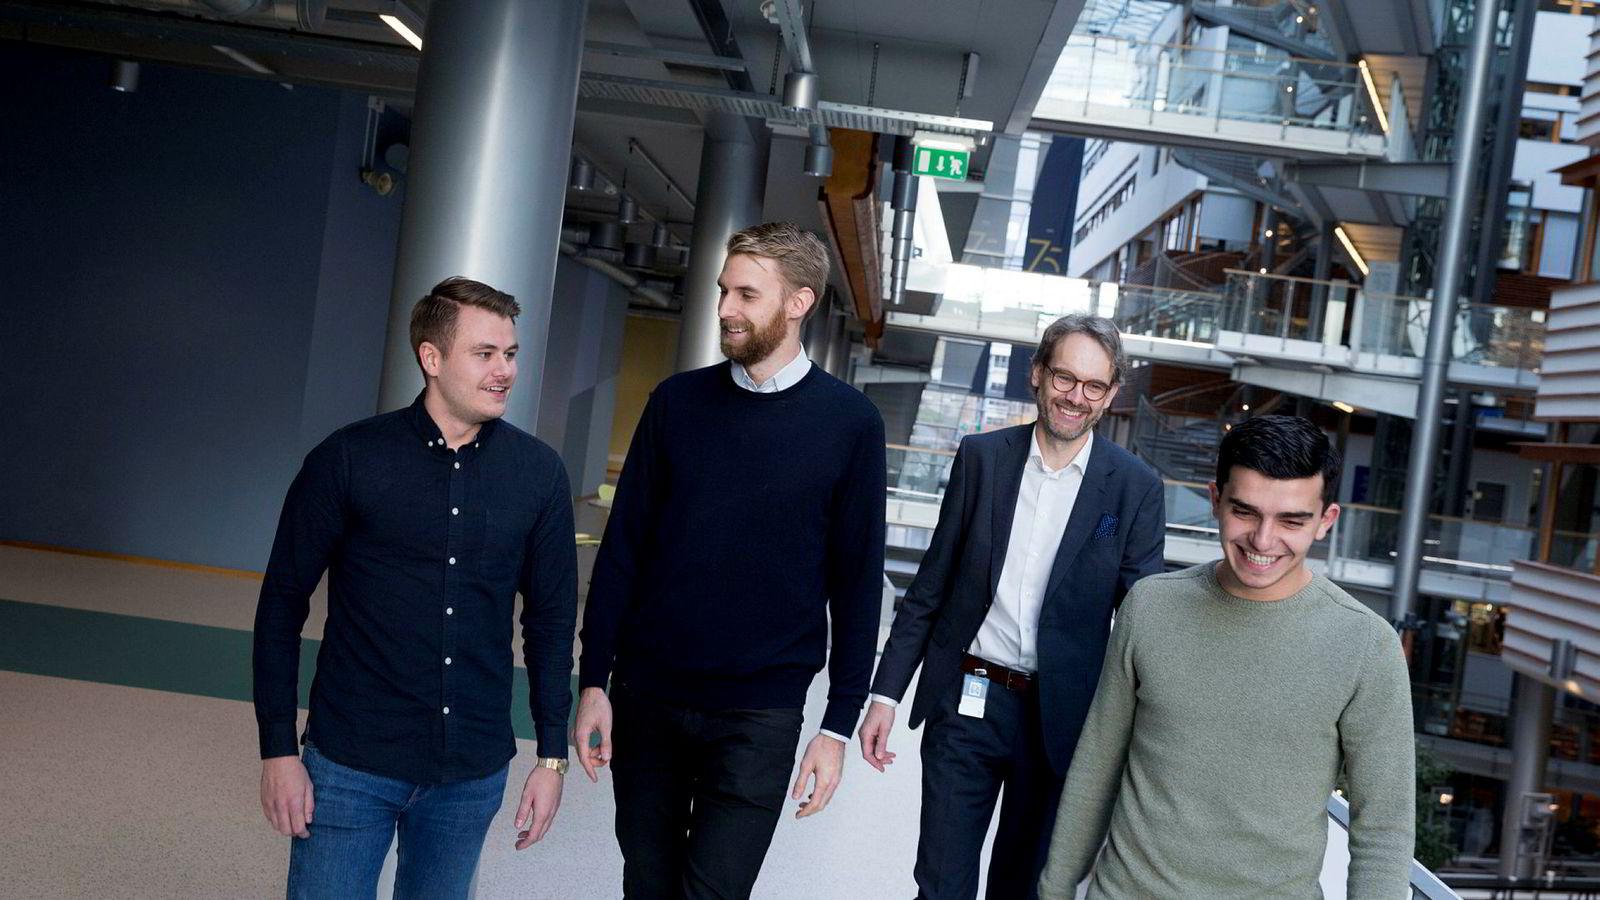 Det er mange økonomer blant landets fremste gründere og BI er godt representert ved (fra venstre) student Martin Flatset Kanck (22), daglig leder i Flexify Thorvald Thorsnes, som har satt sammen listen, Tor Haugnes ved BI og student Adriatik Håti (26).